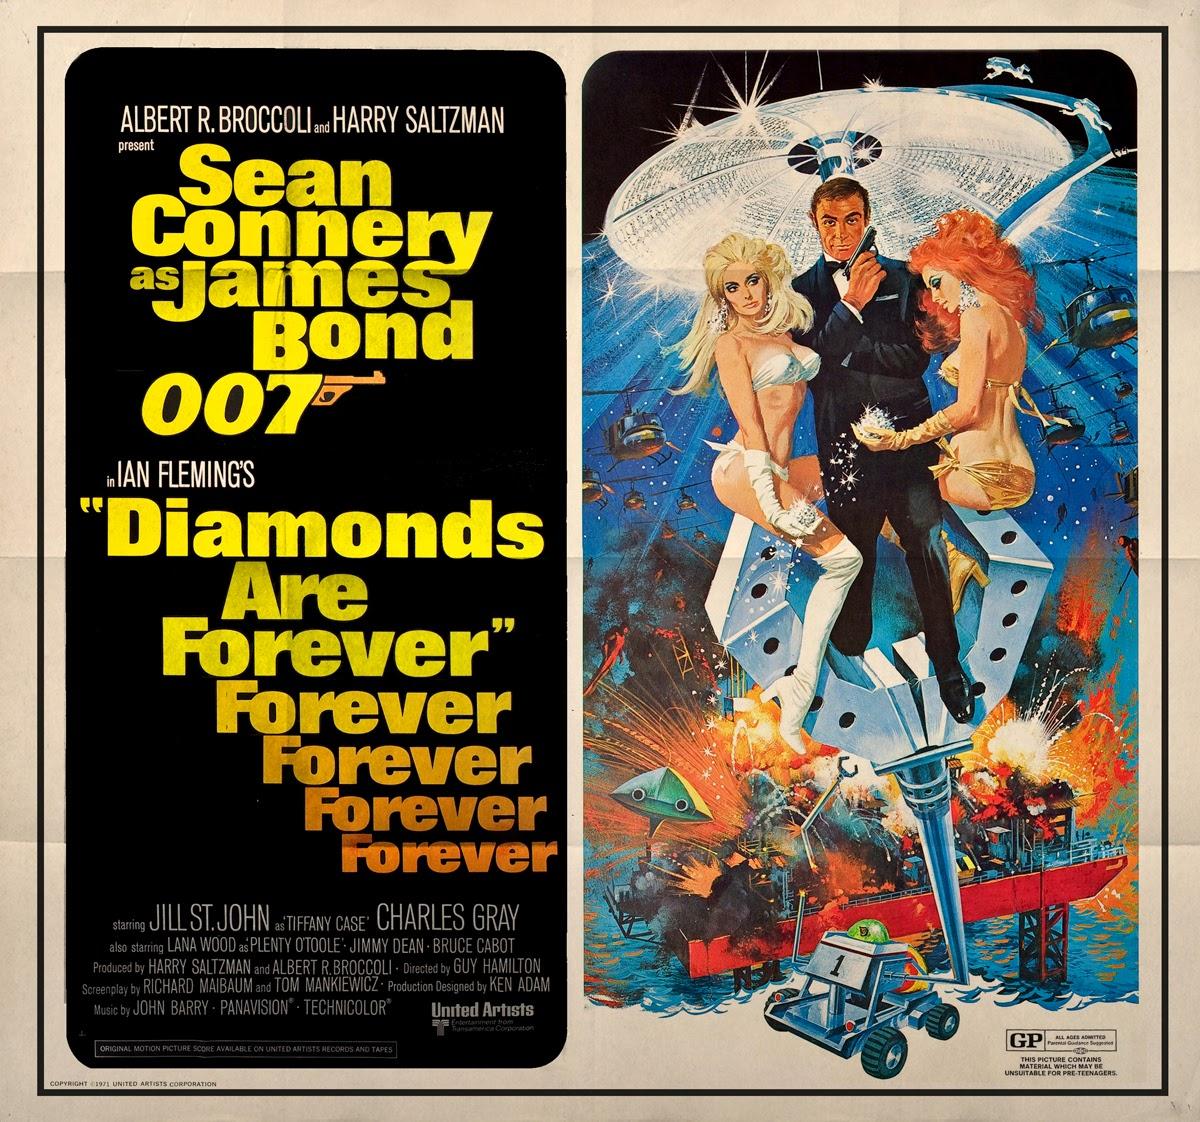 diamonds are forever jame4s bond 007 us subway poster.jpg